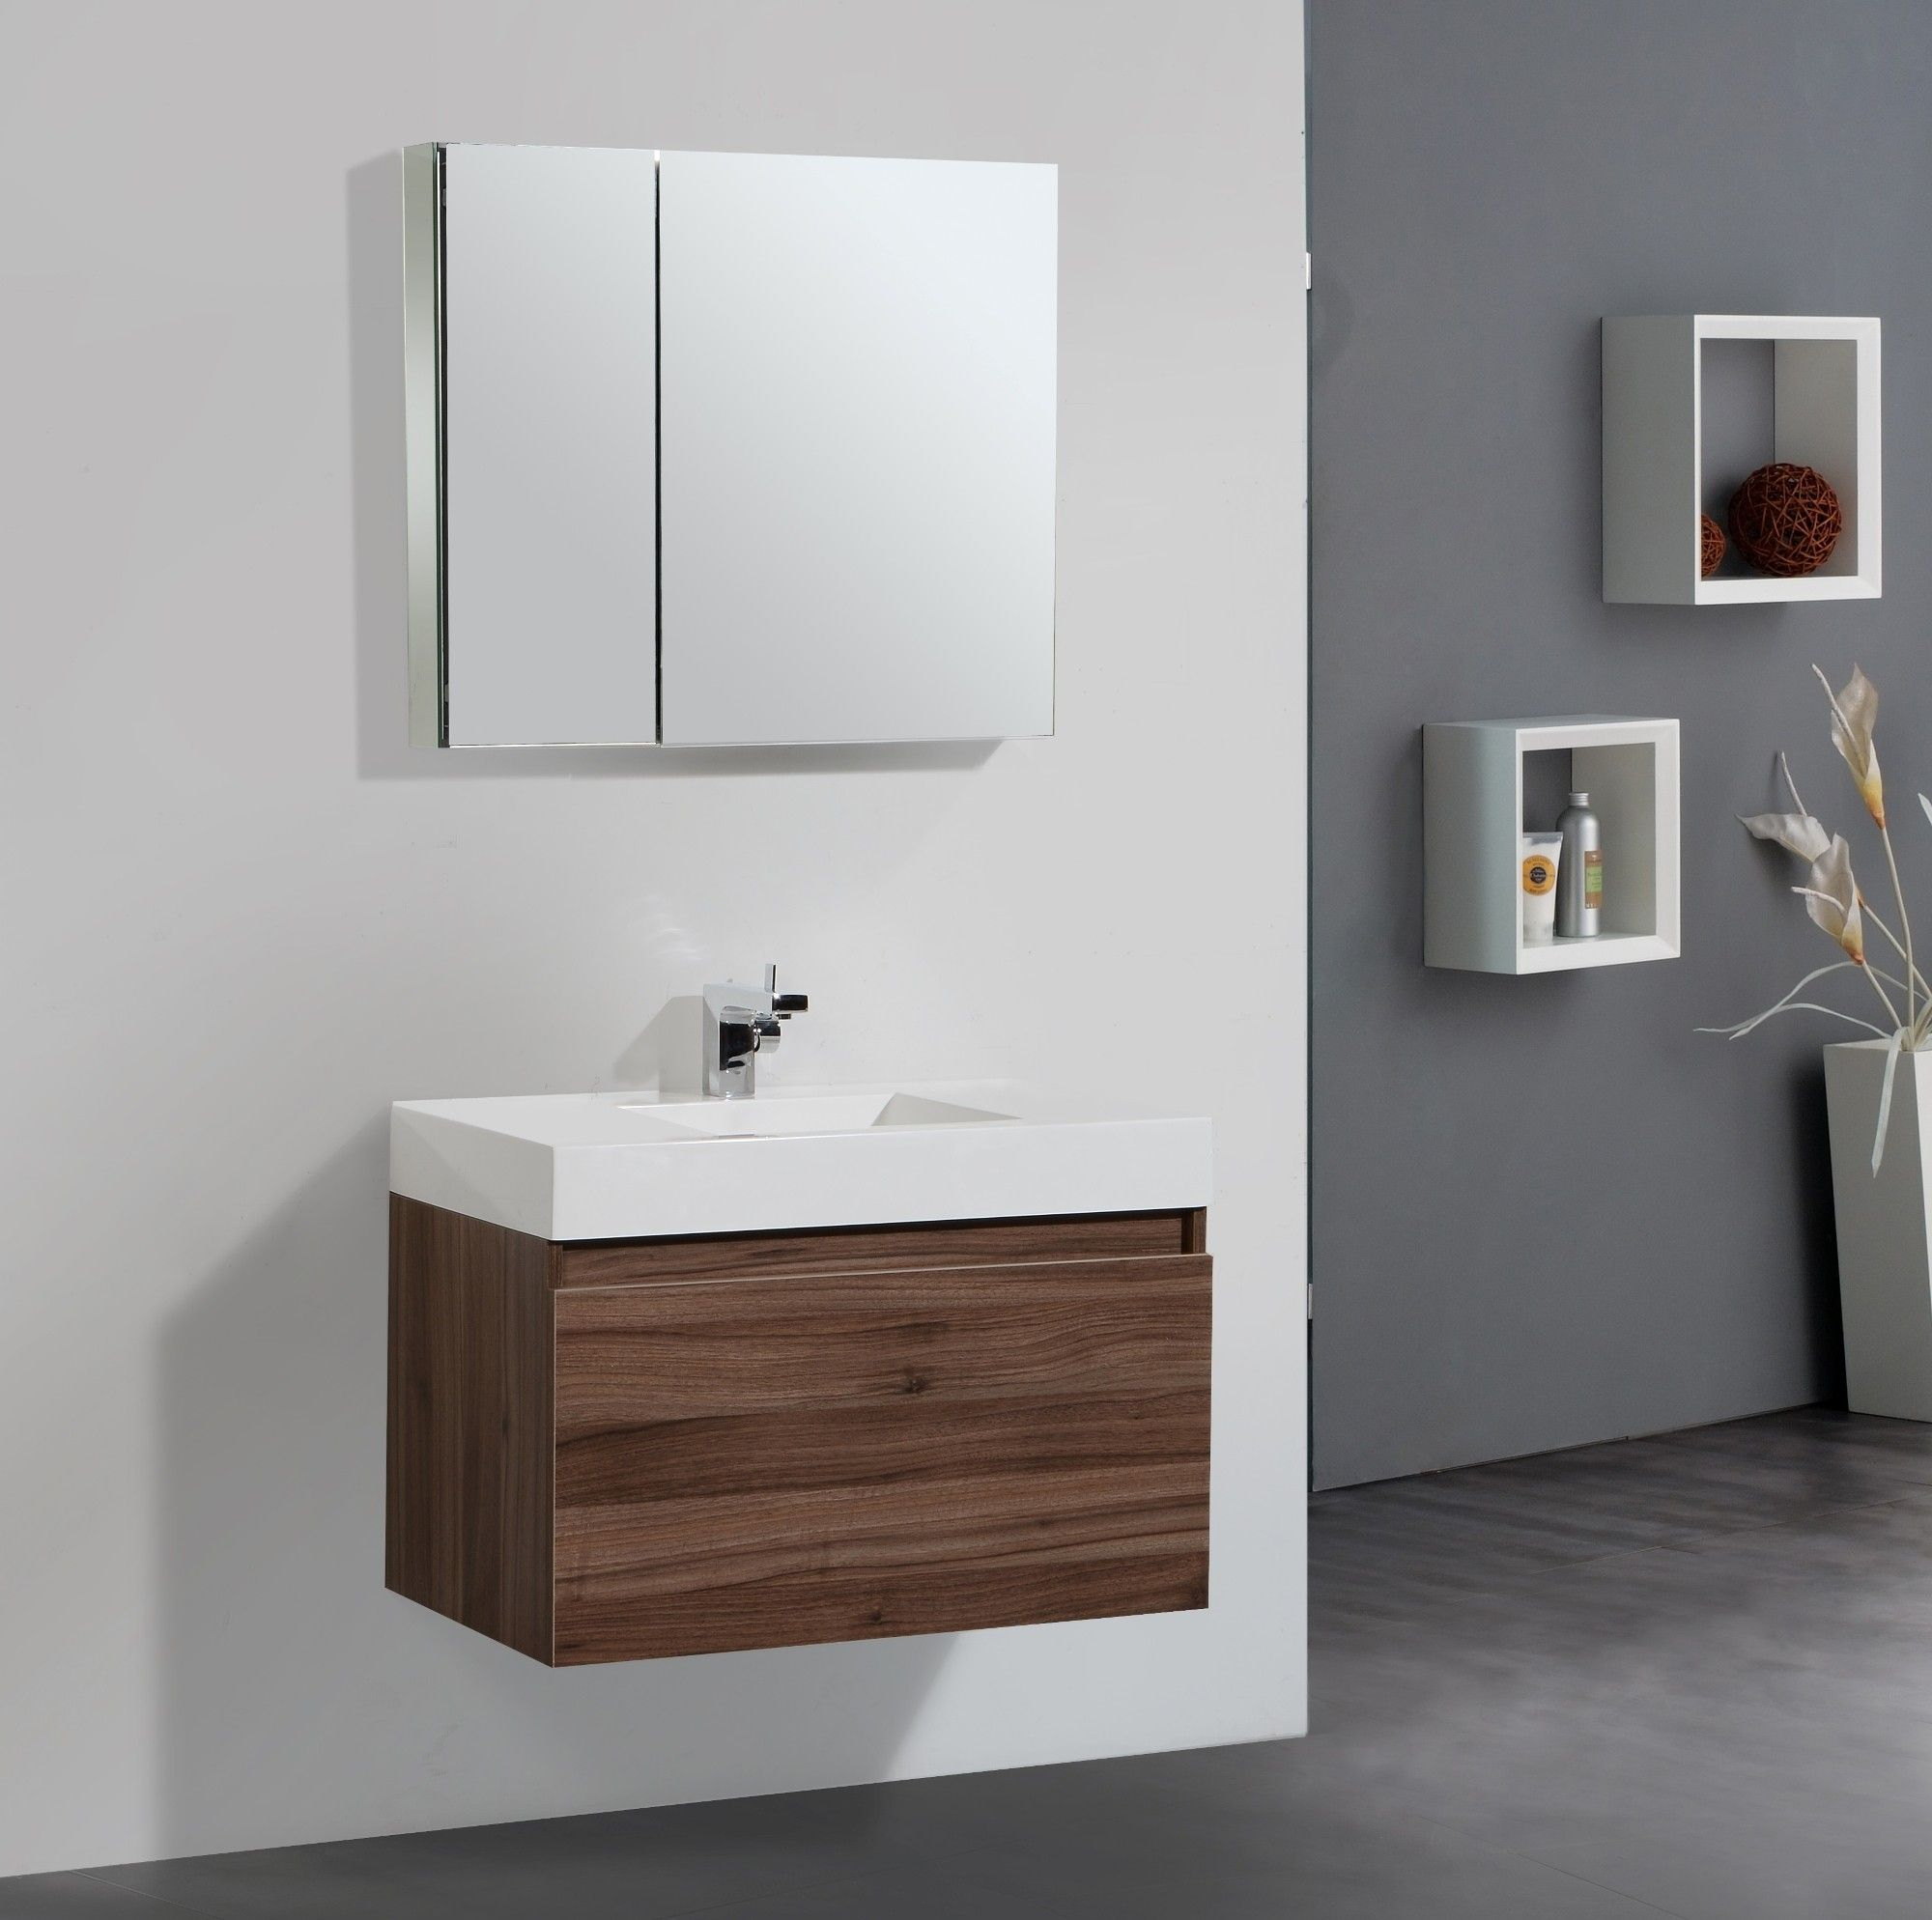 30 Best Bathroom Cabinet Ideas | Small bathroom vanities ...